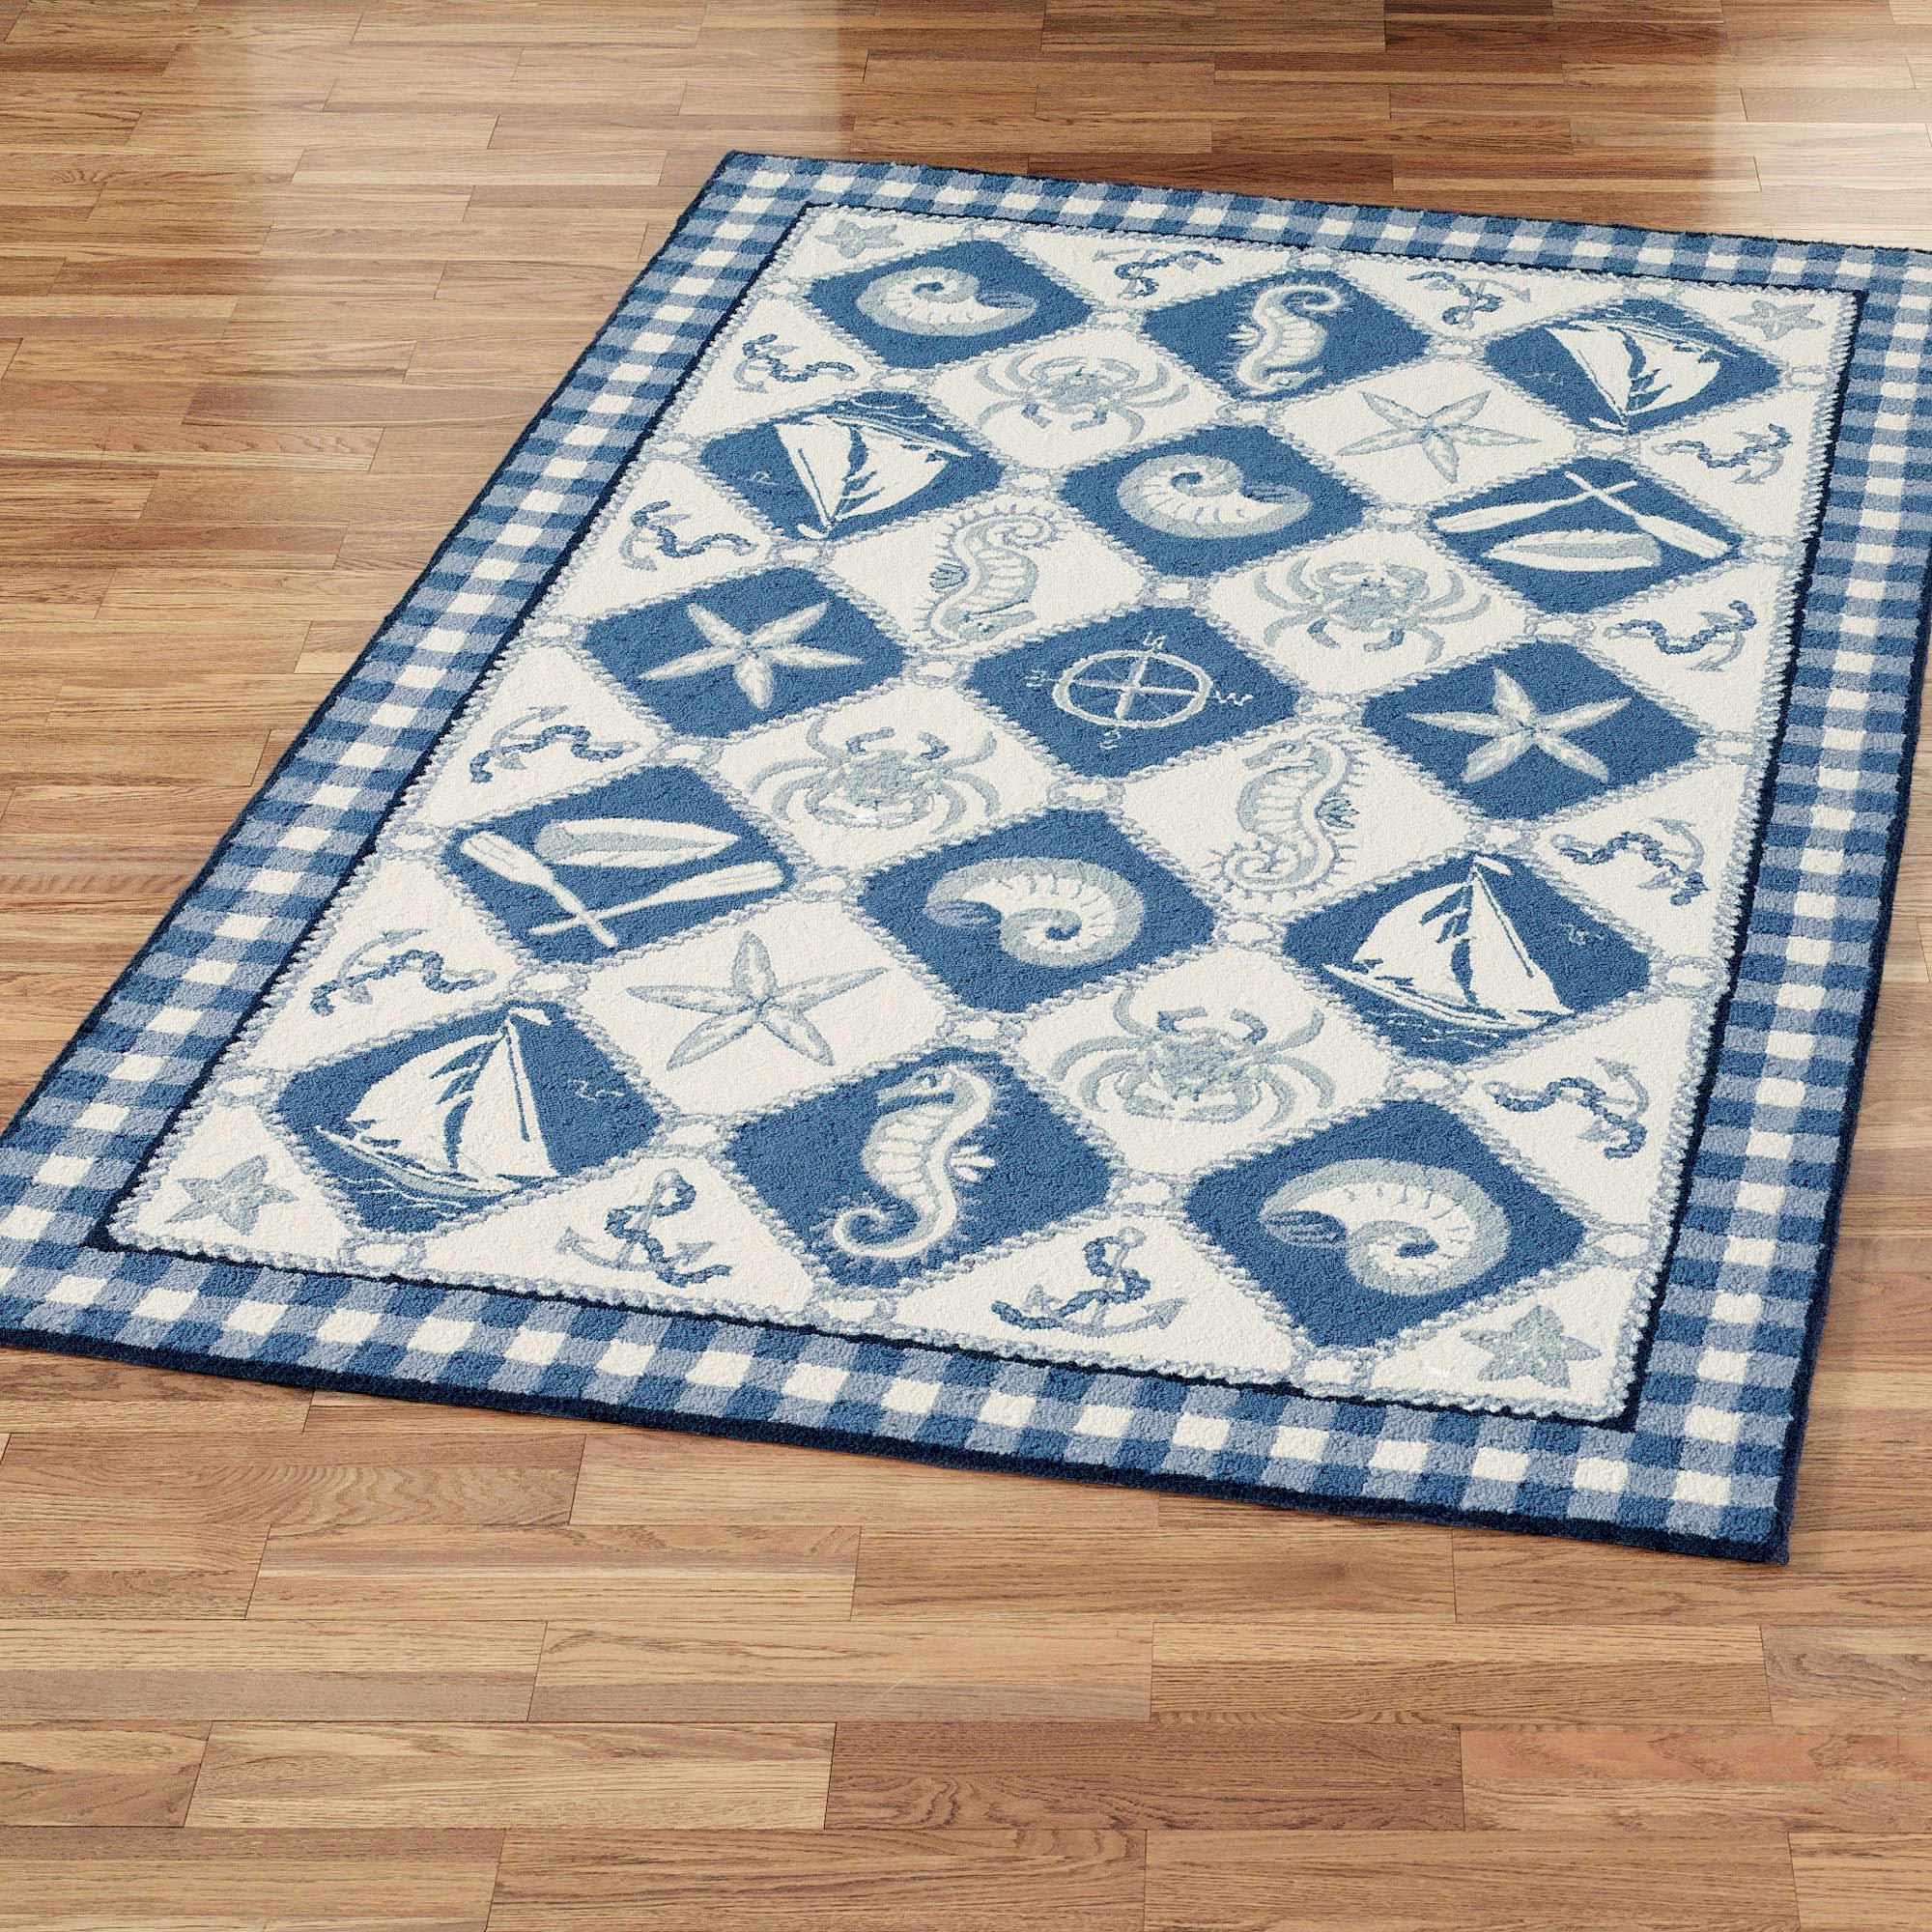 coastal kitchen rugs cheap carts 17 roy home design download original resolution